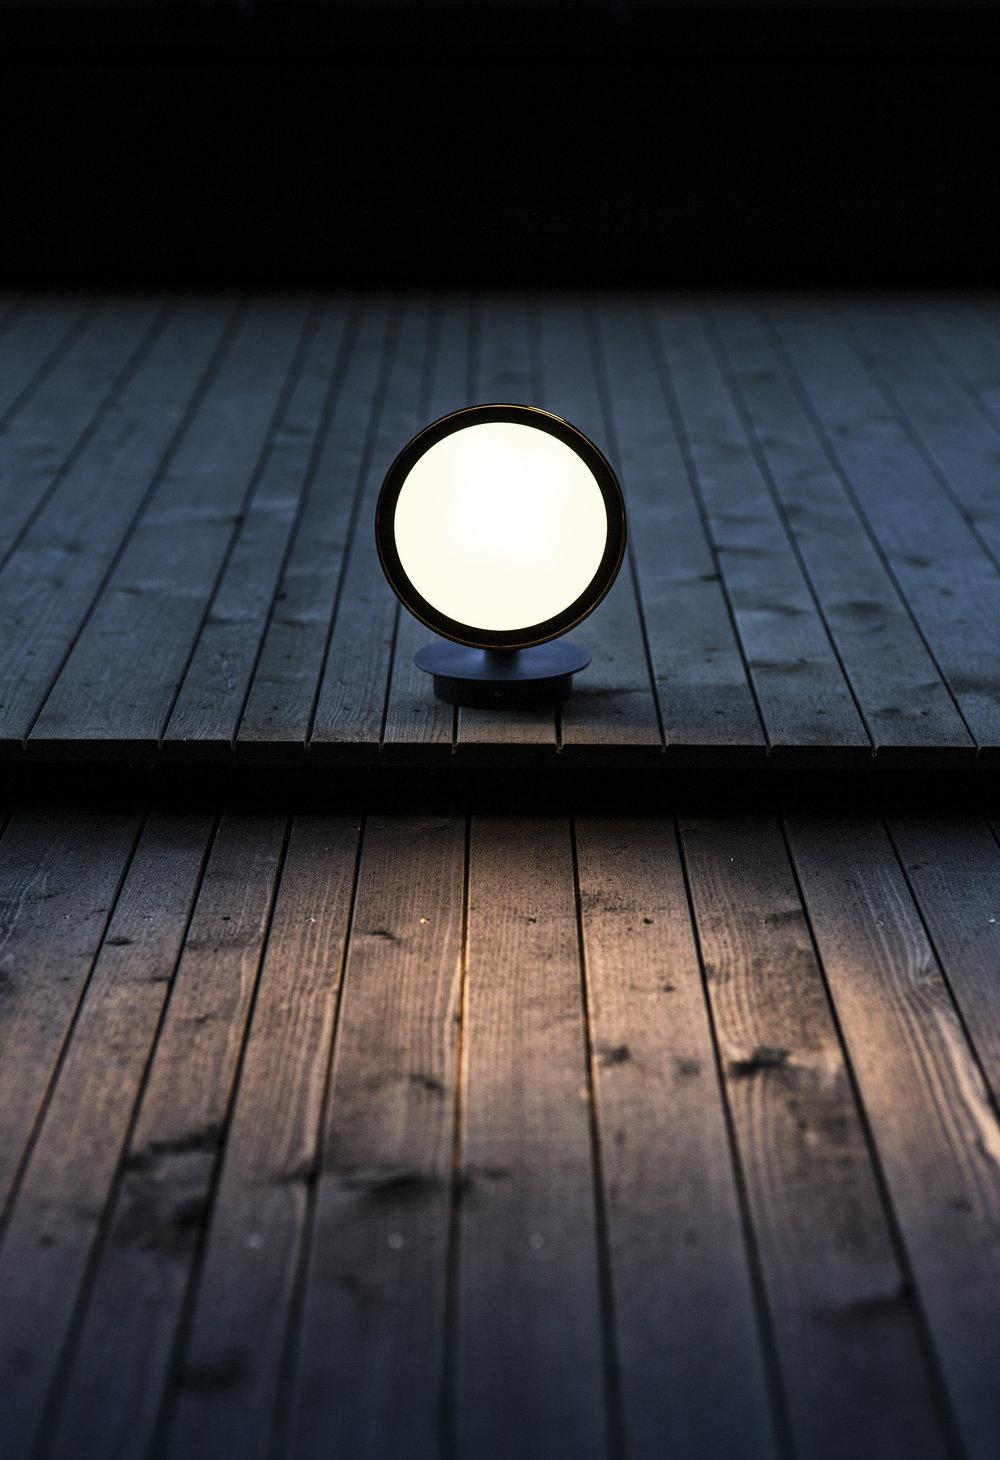 Belysning  - Riktig lyssetting skaper en spennende fasade